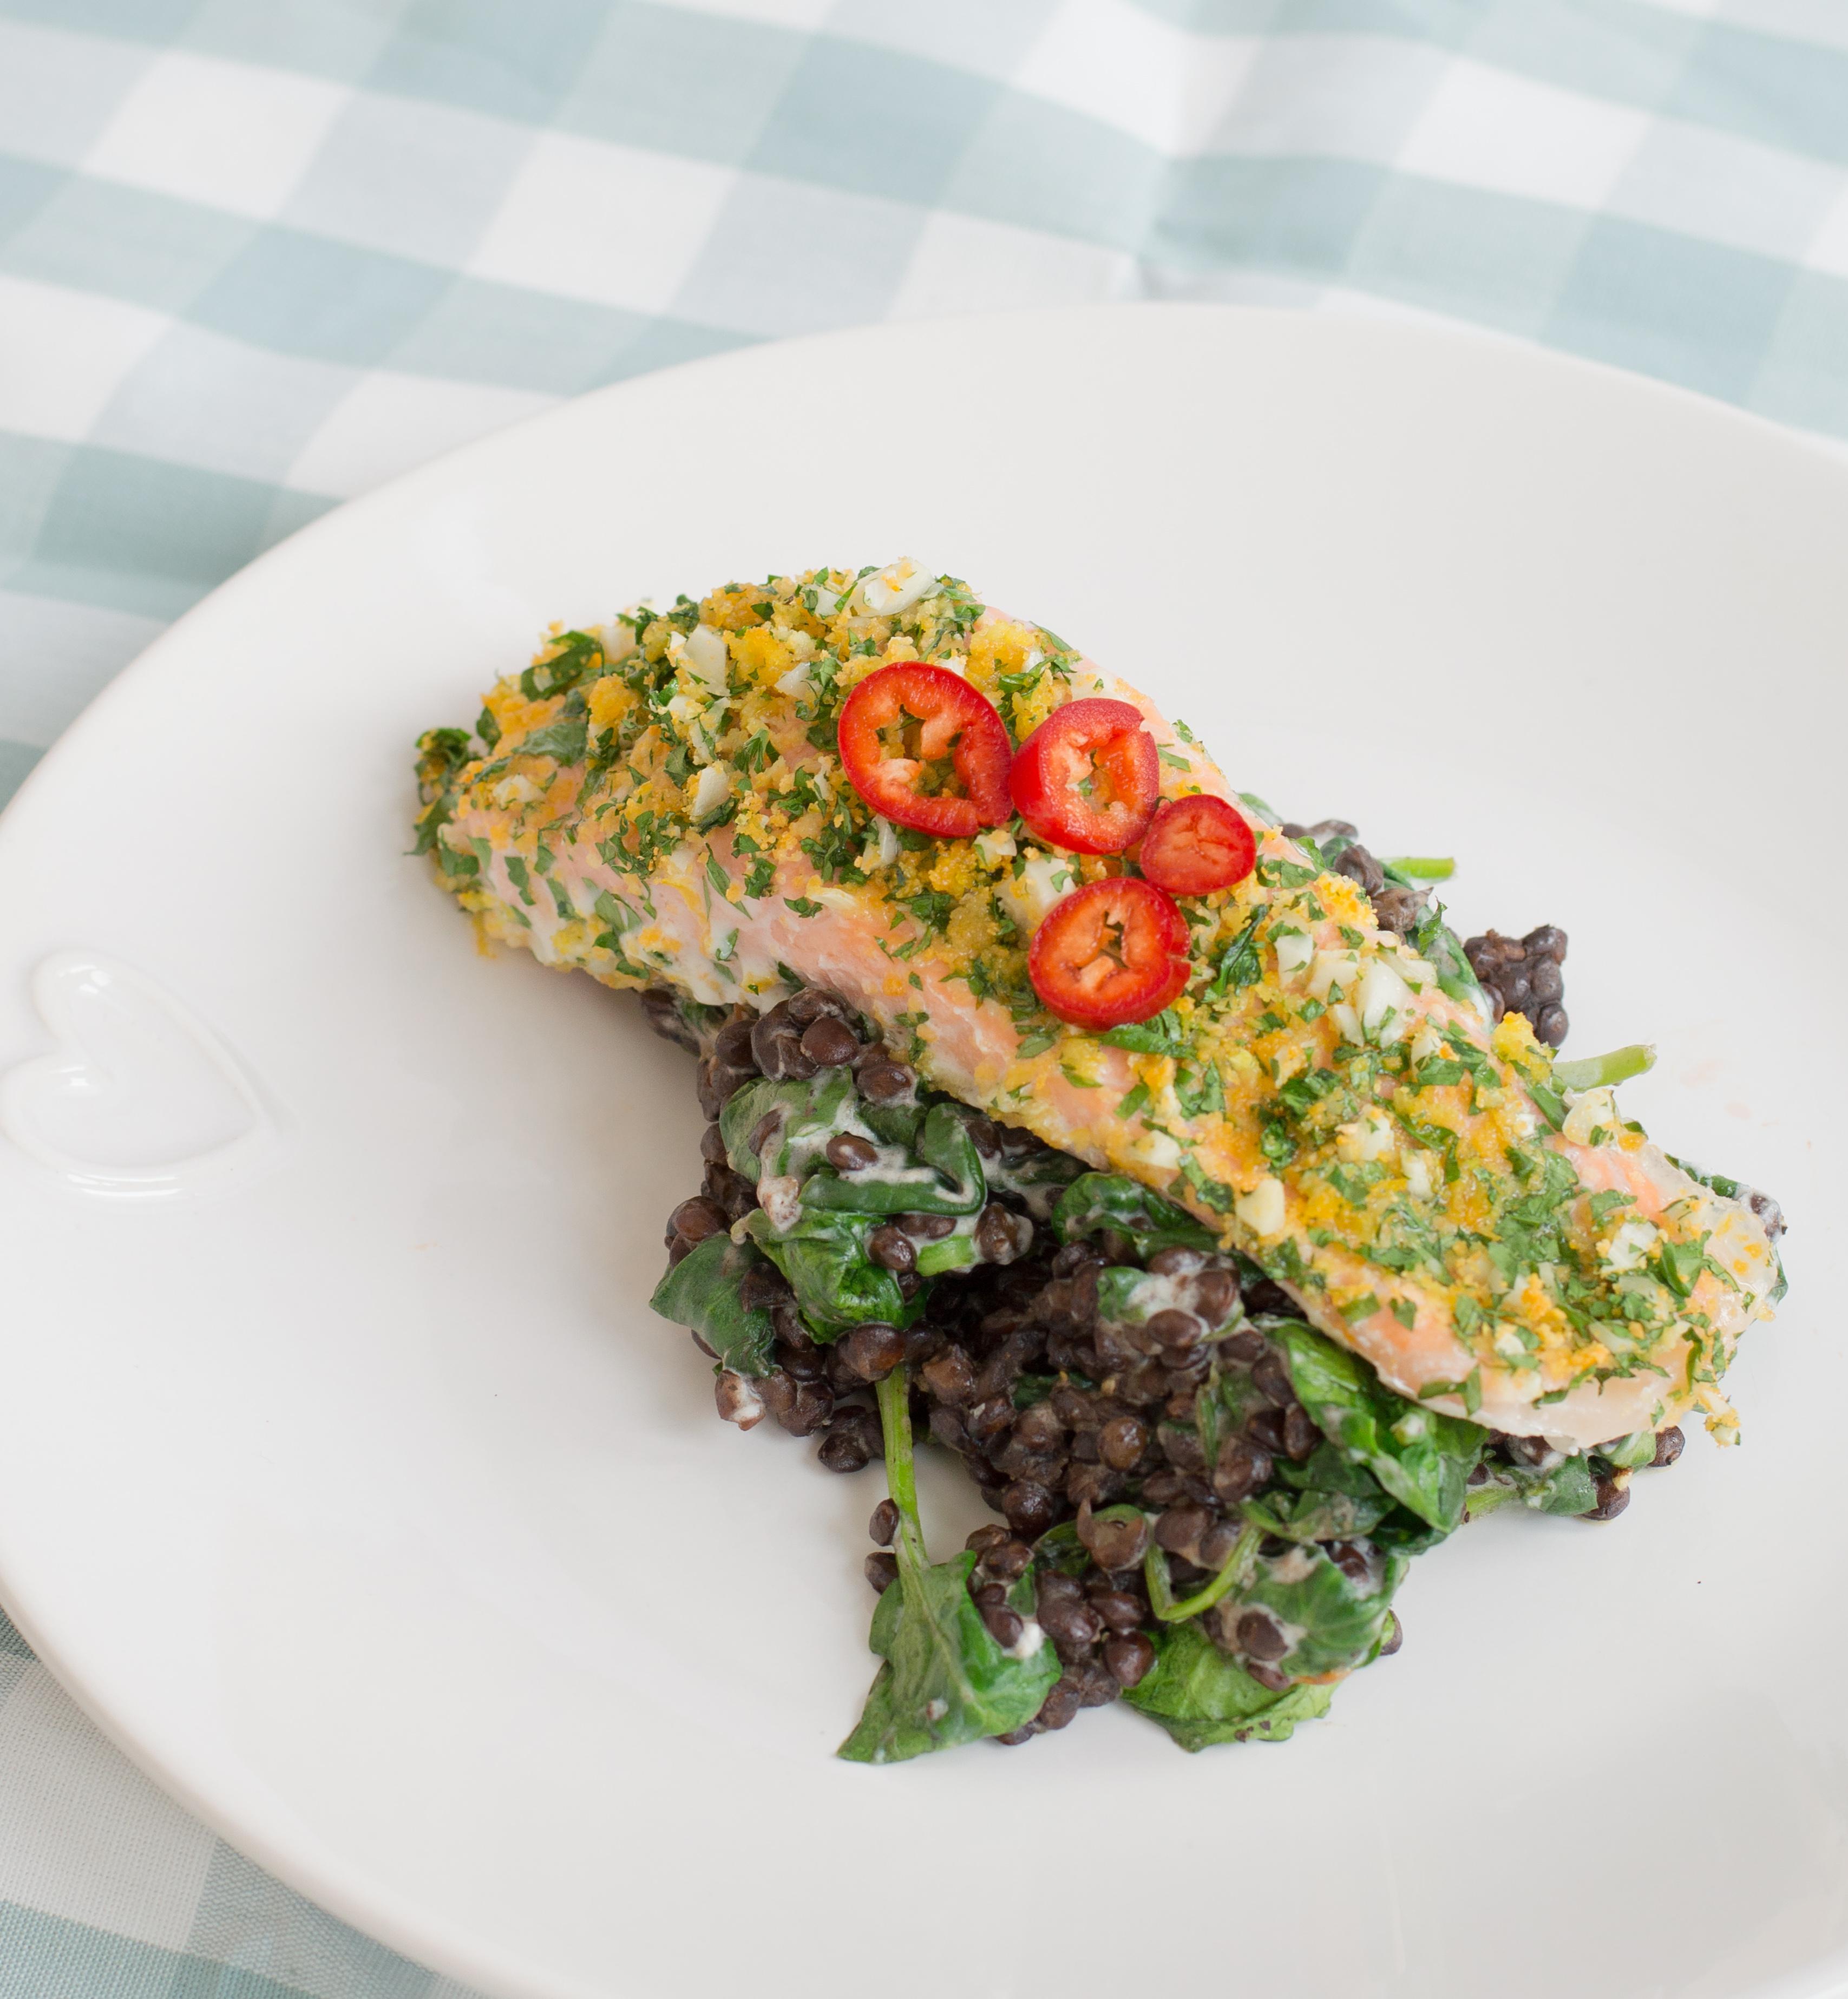 Herb & Lemon-crusted Salmon